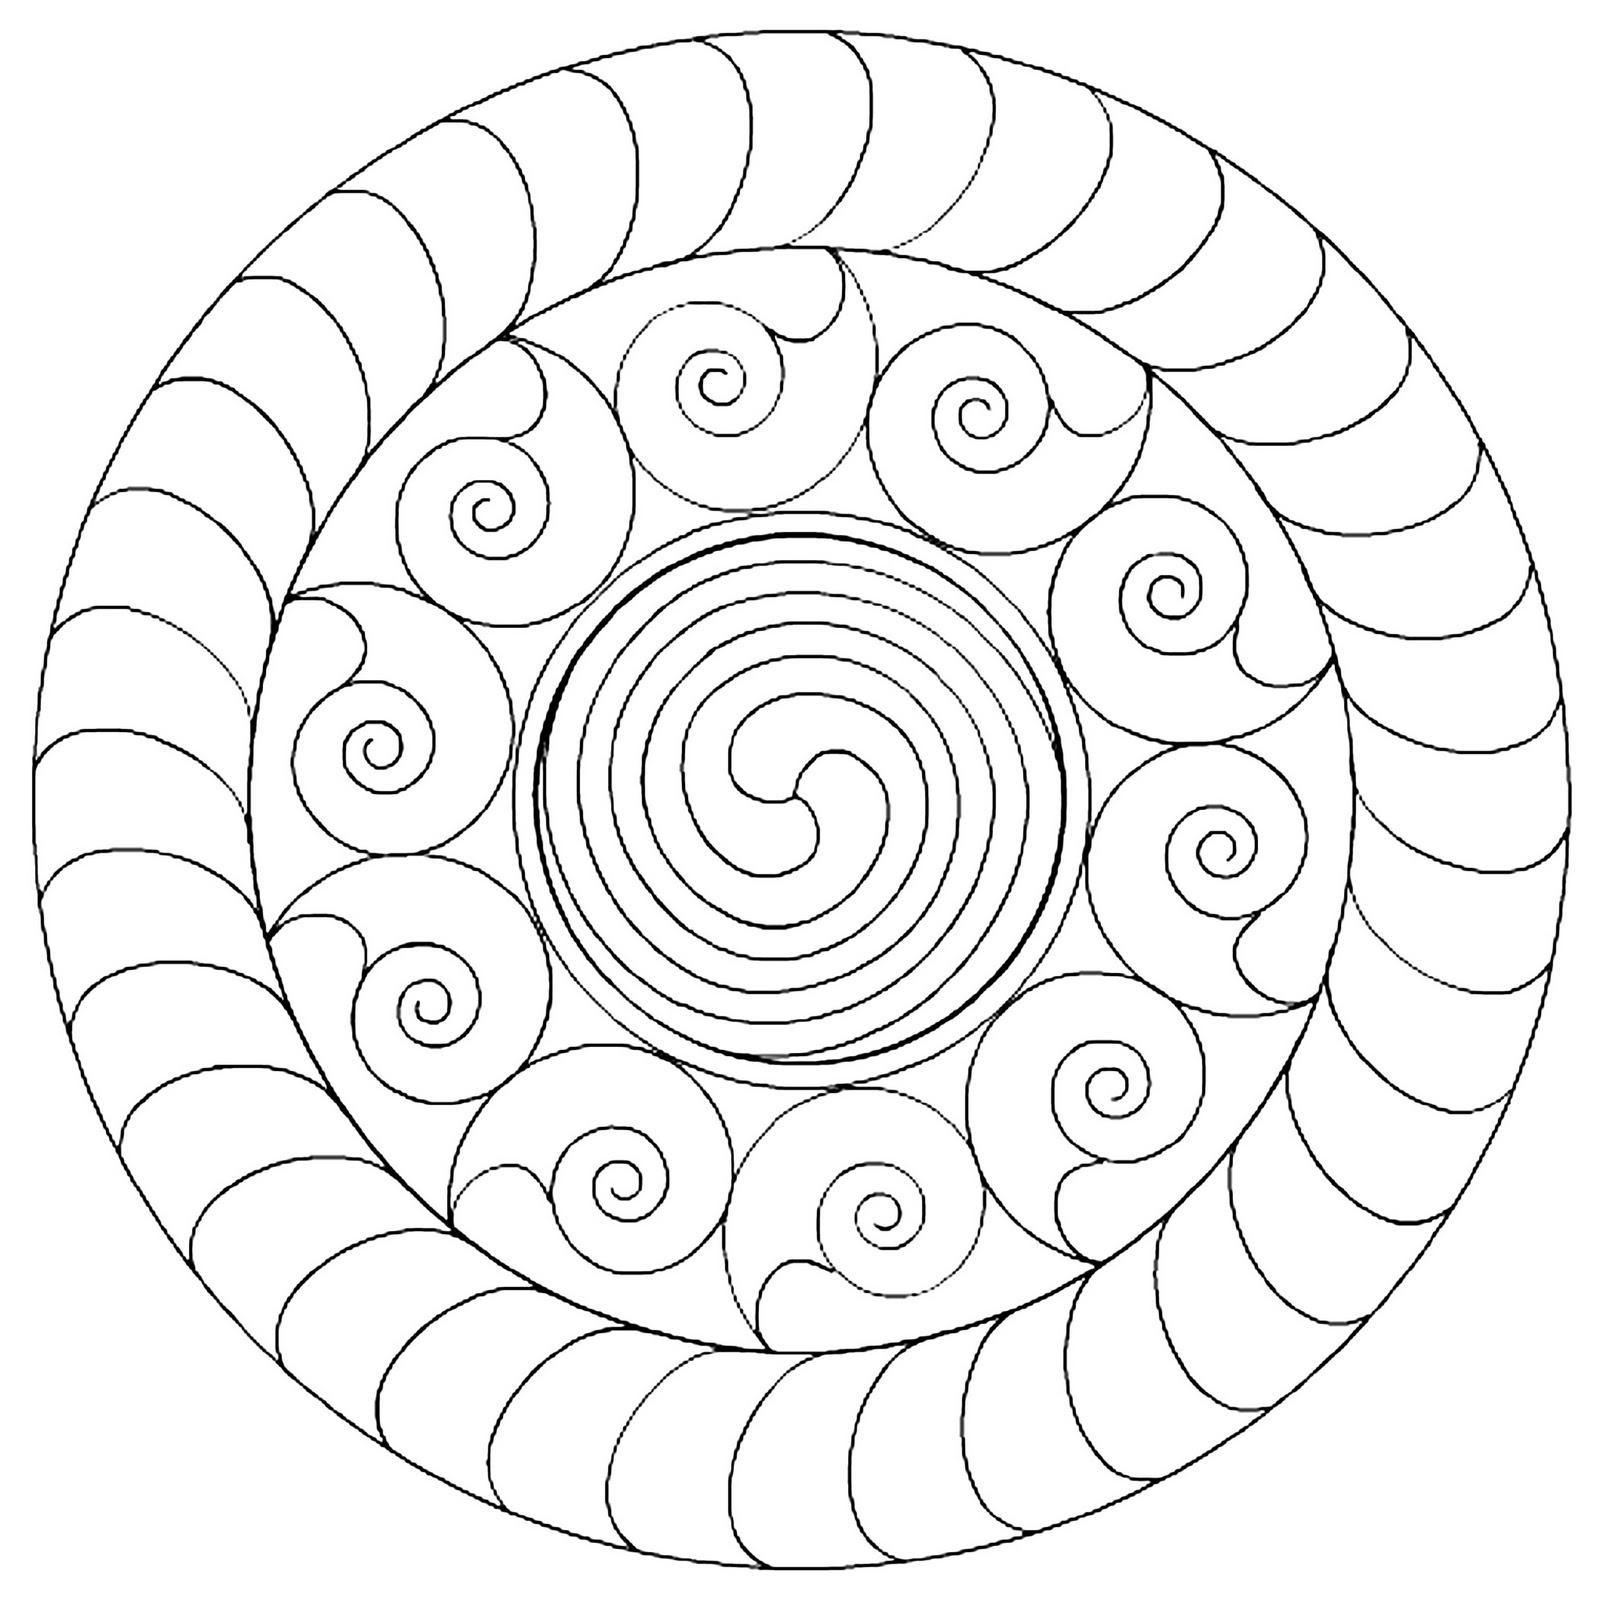 8 Images of Blank Printable Mandalas